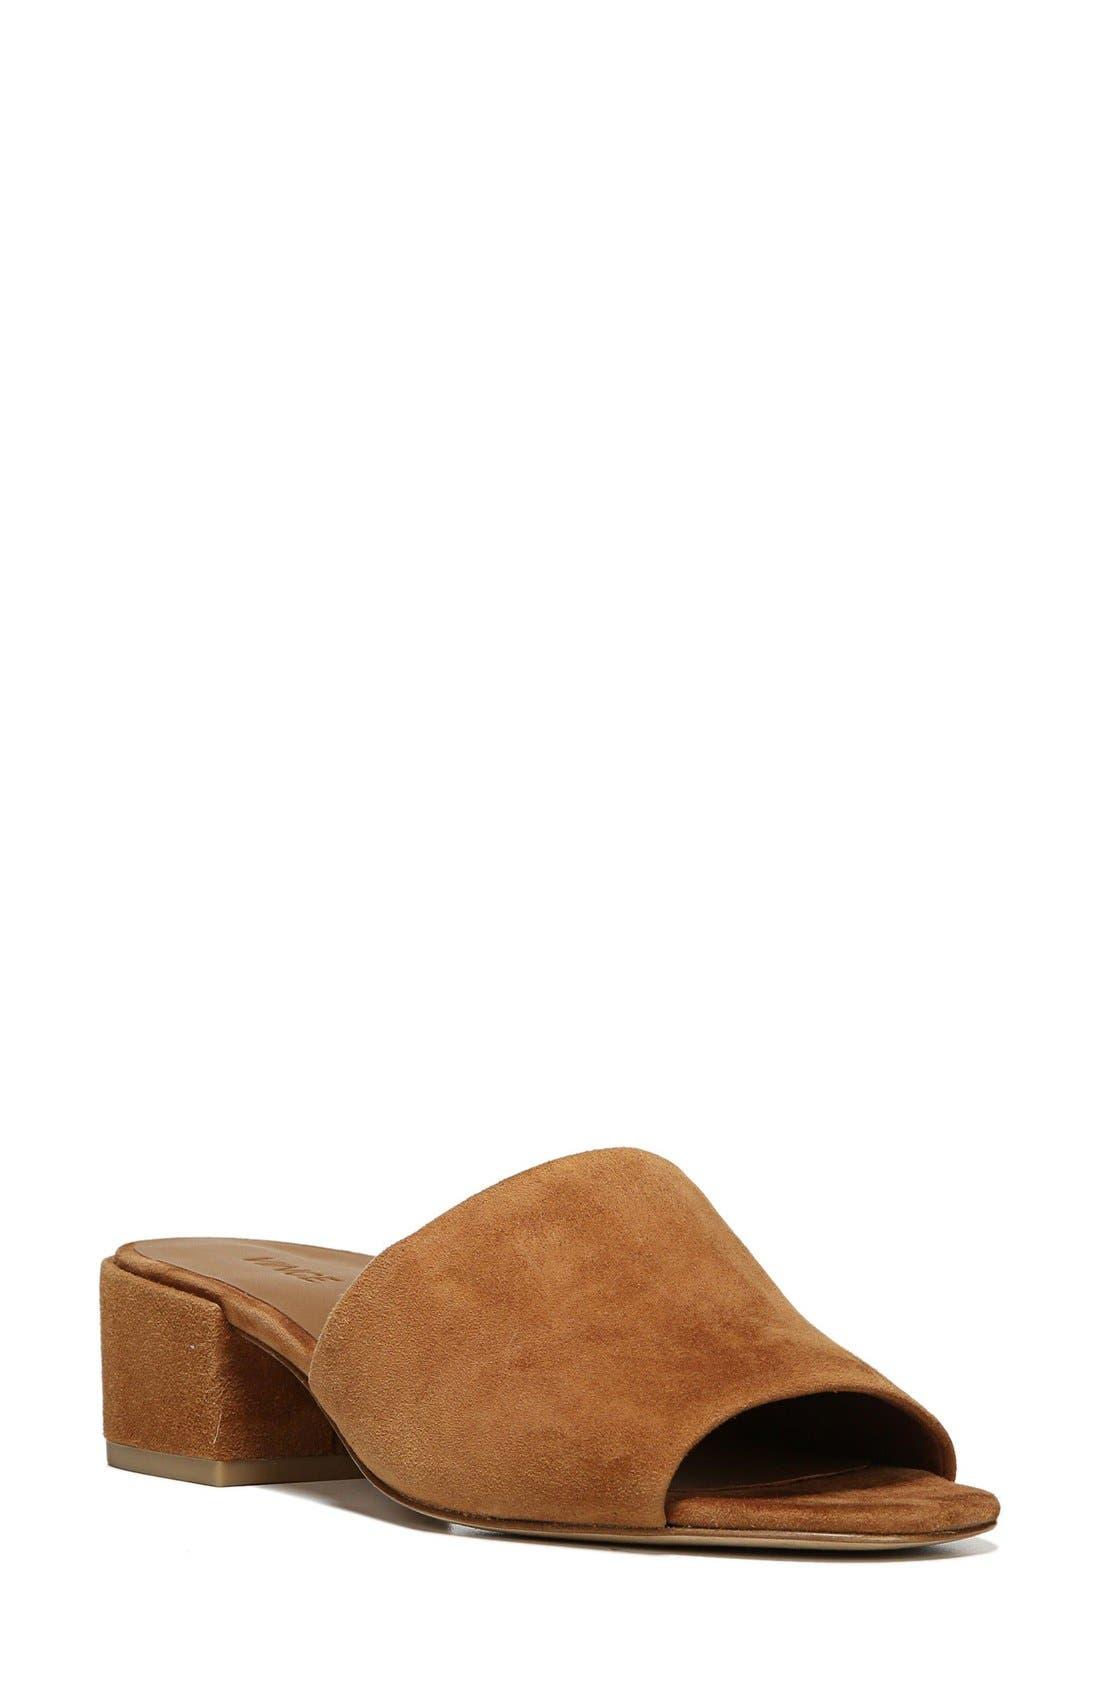 Rachelle Slide Sandal,                         Main,                         color, Cedar